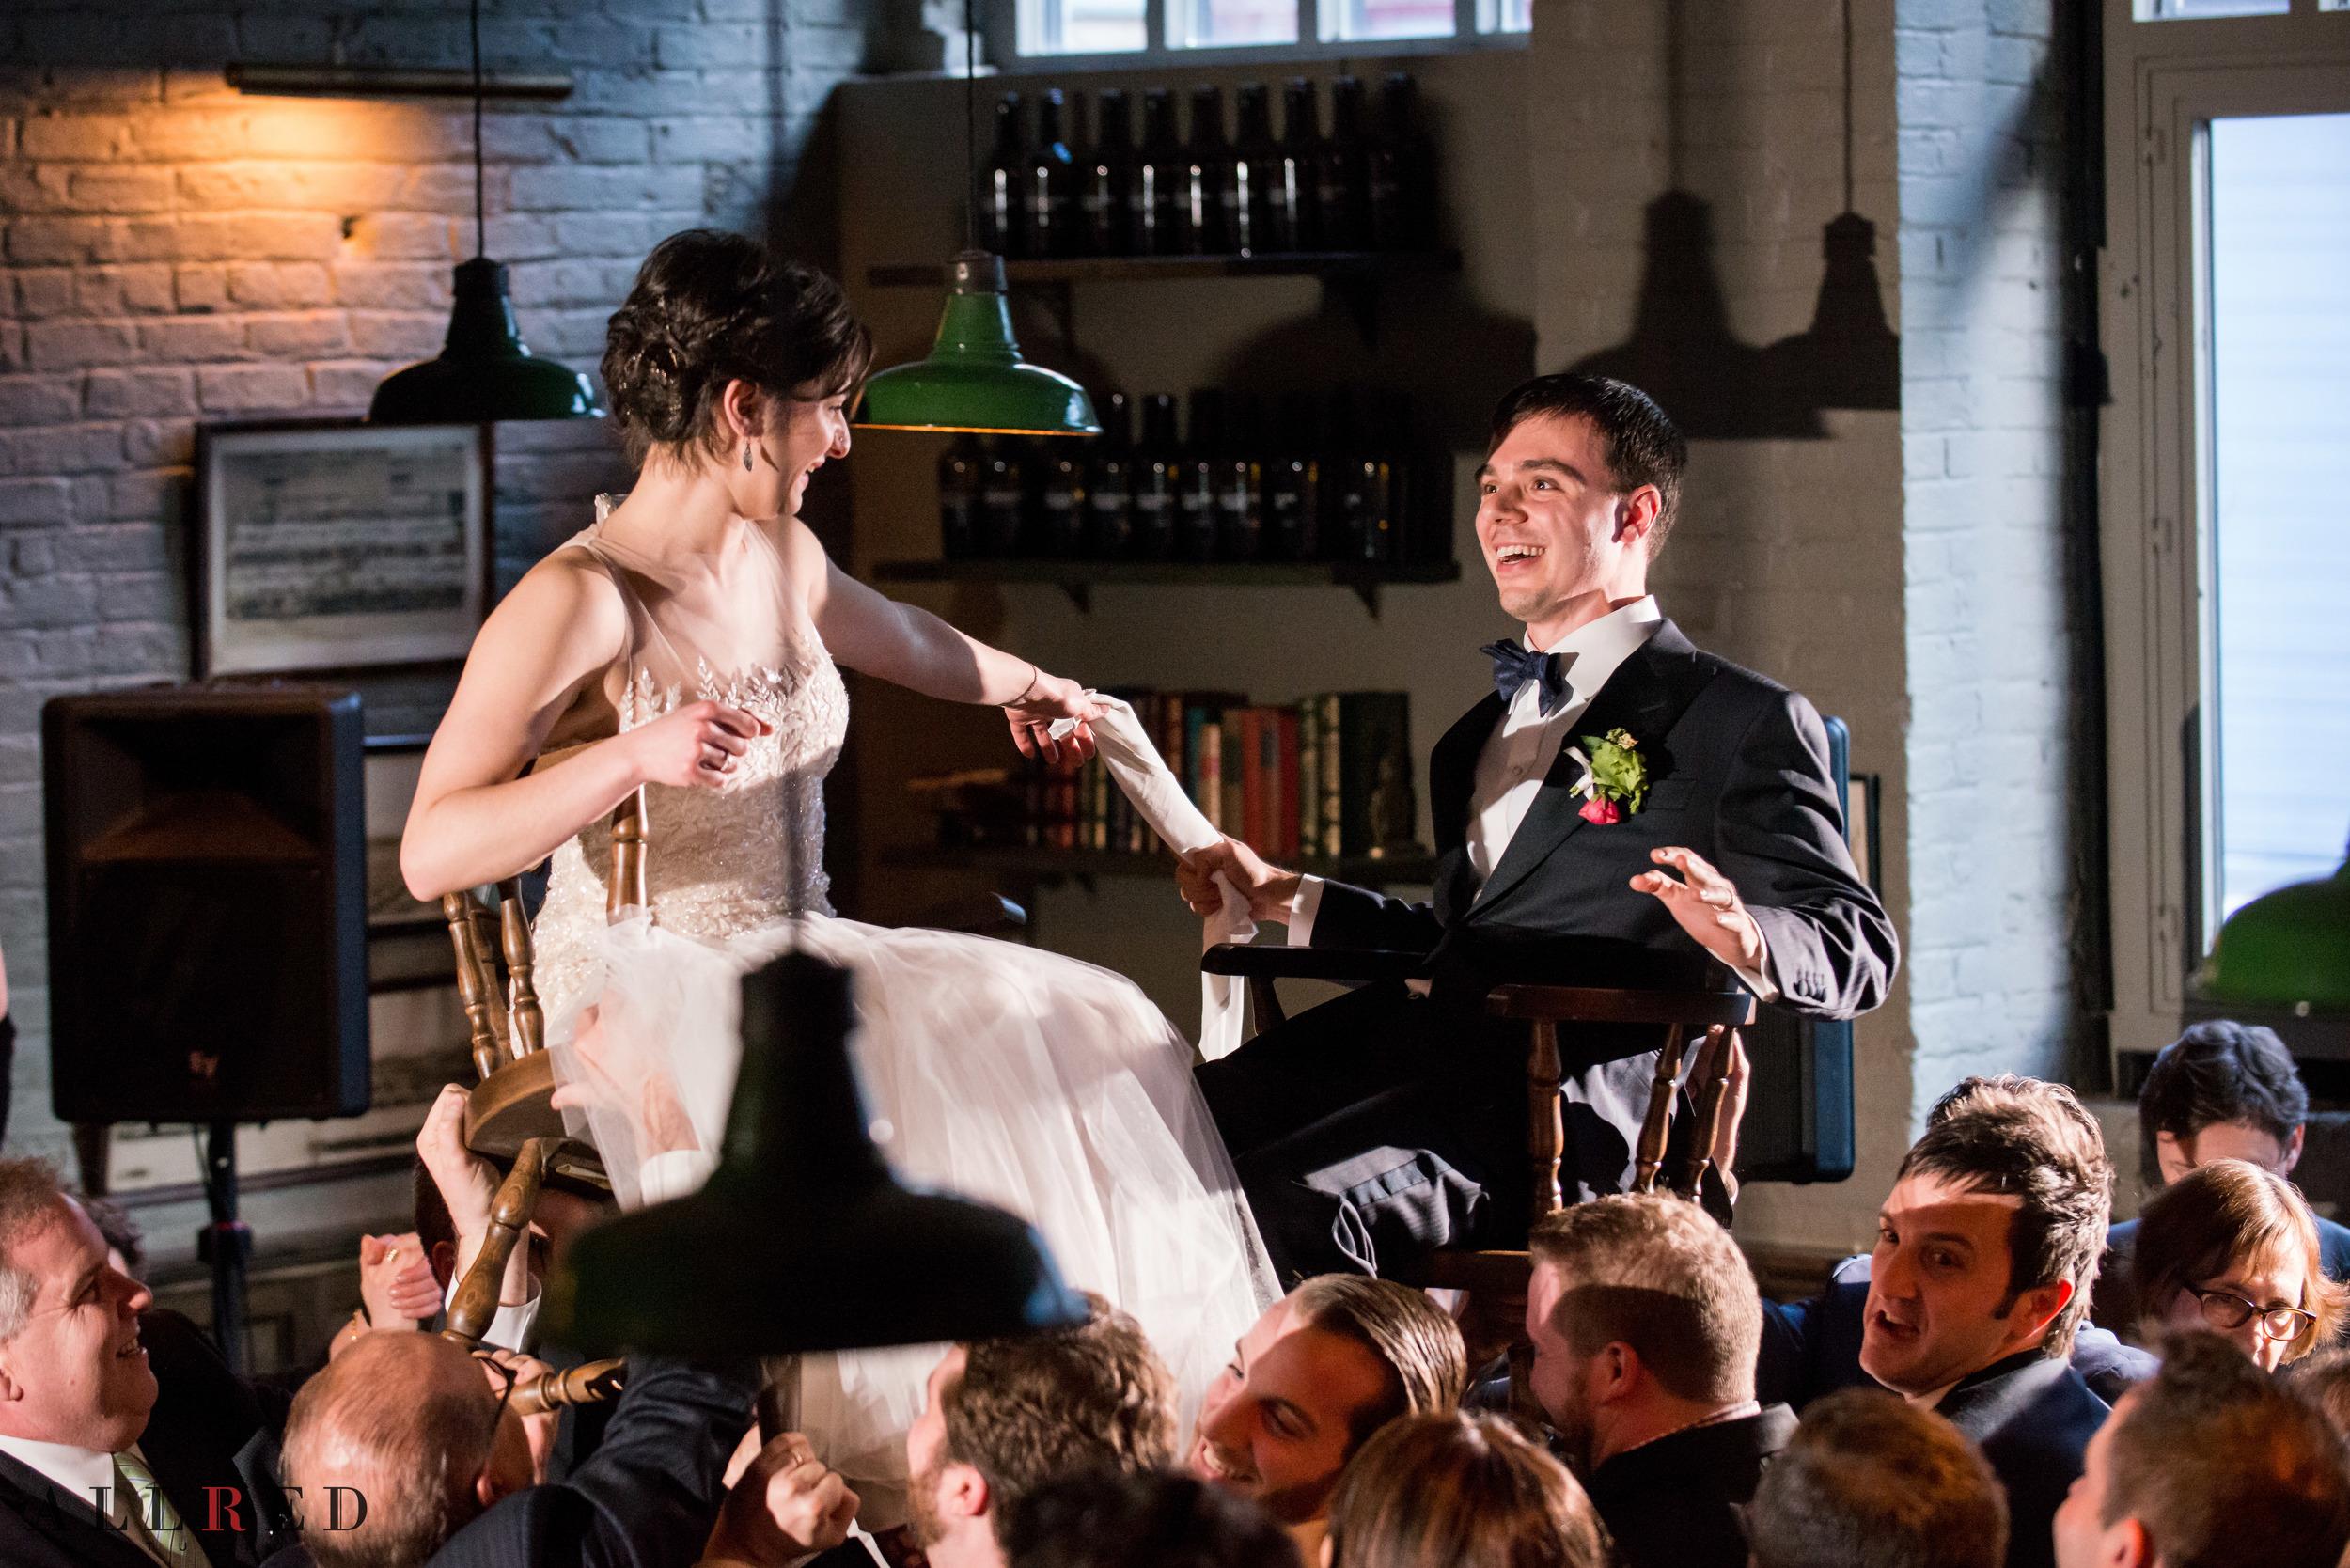 Wedding-Brooklyn-winery-allred-studio-new-york-photographer-new-jersey-hudson-valley-1301.jpg